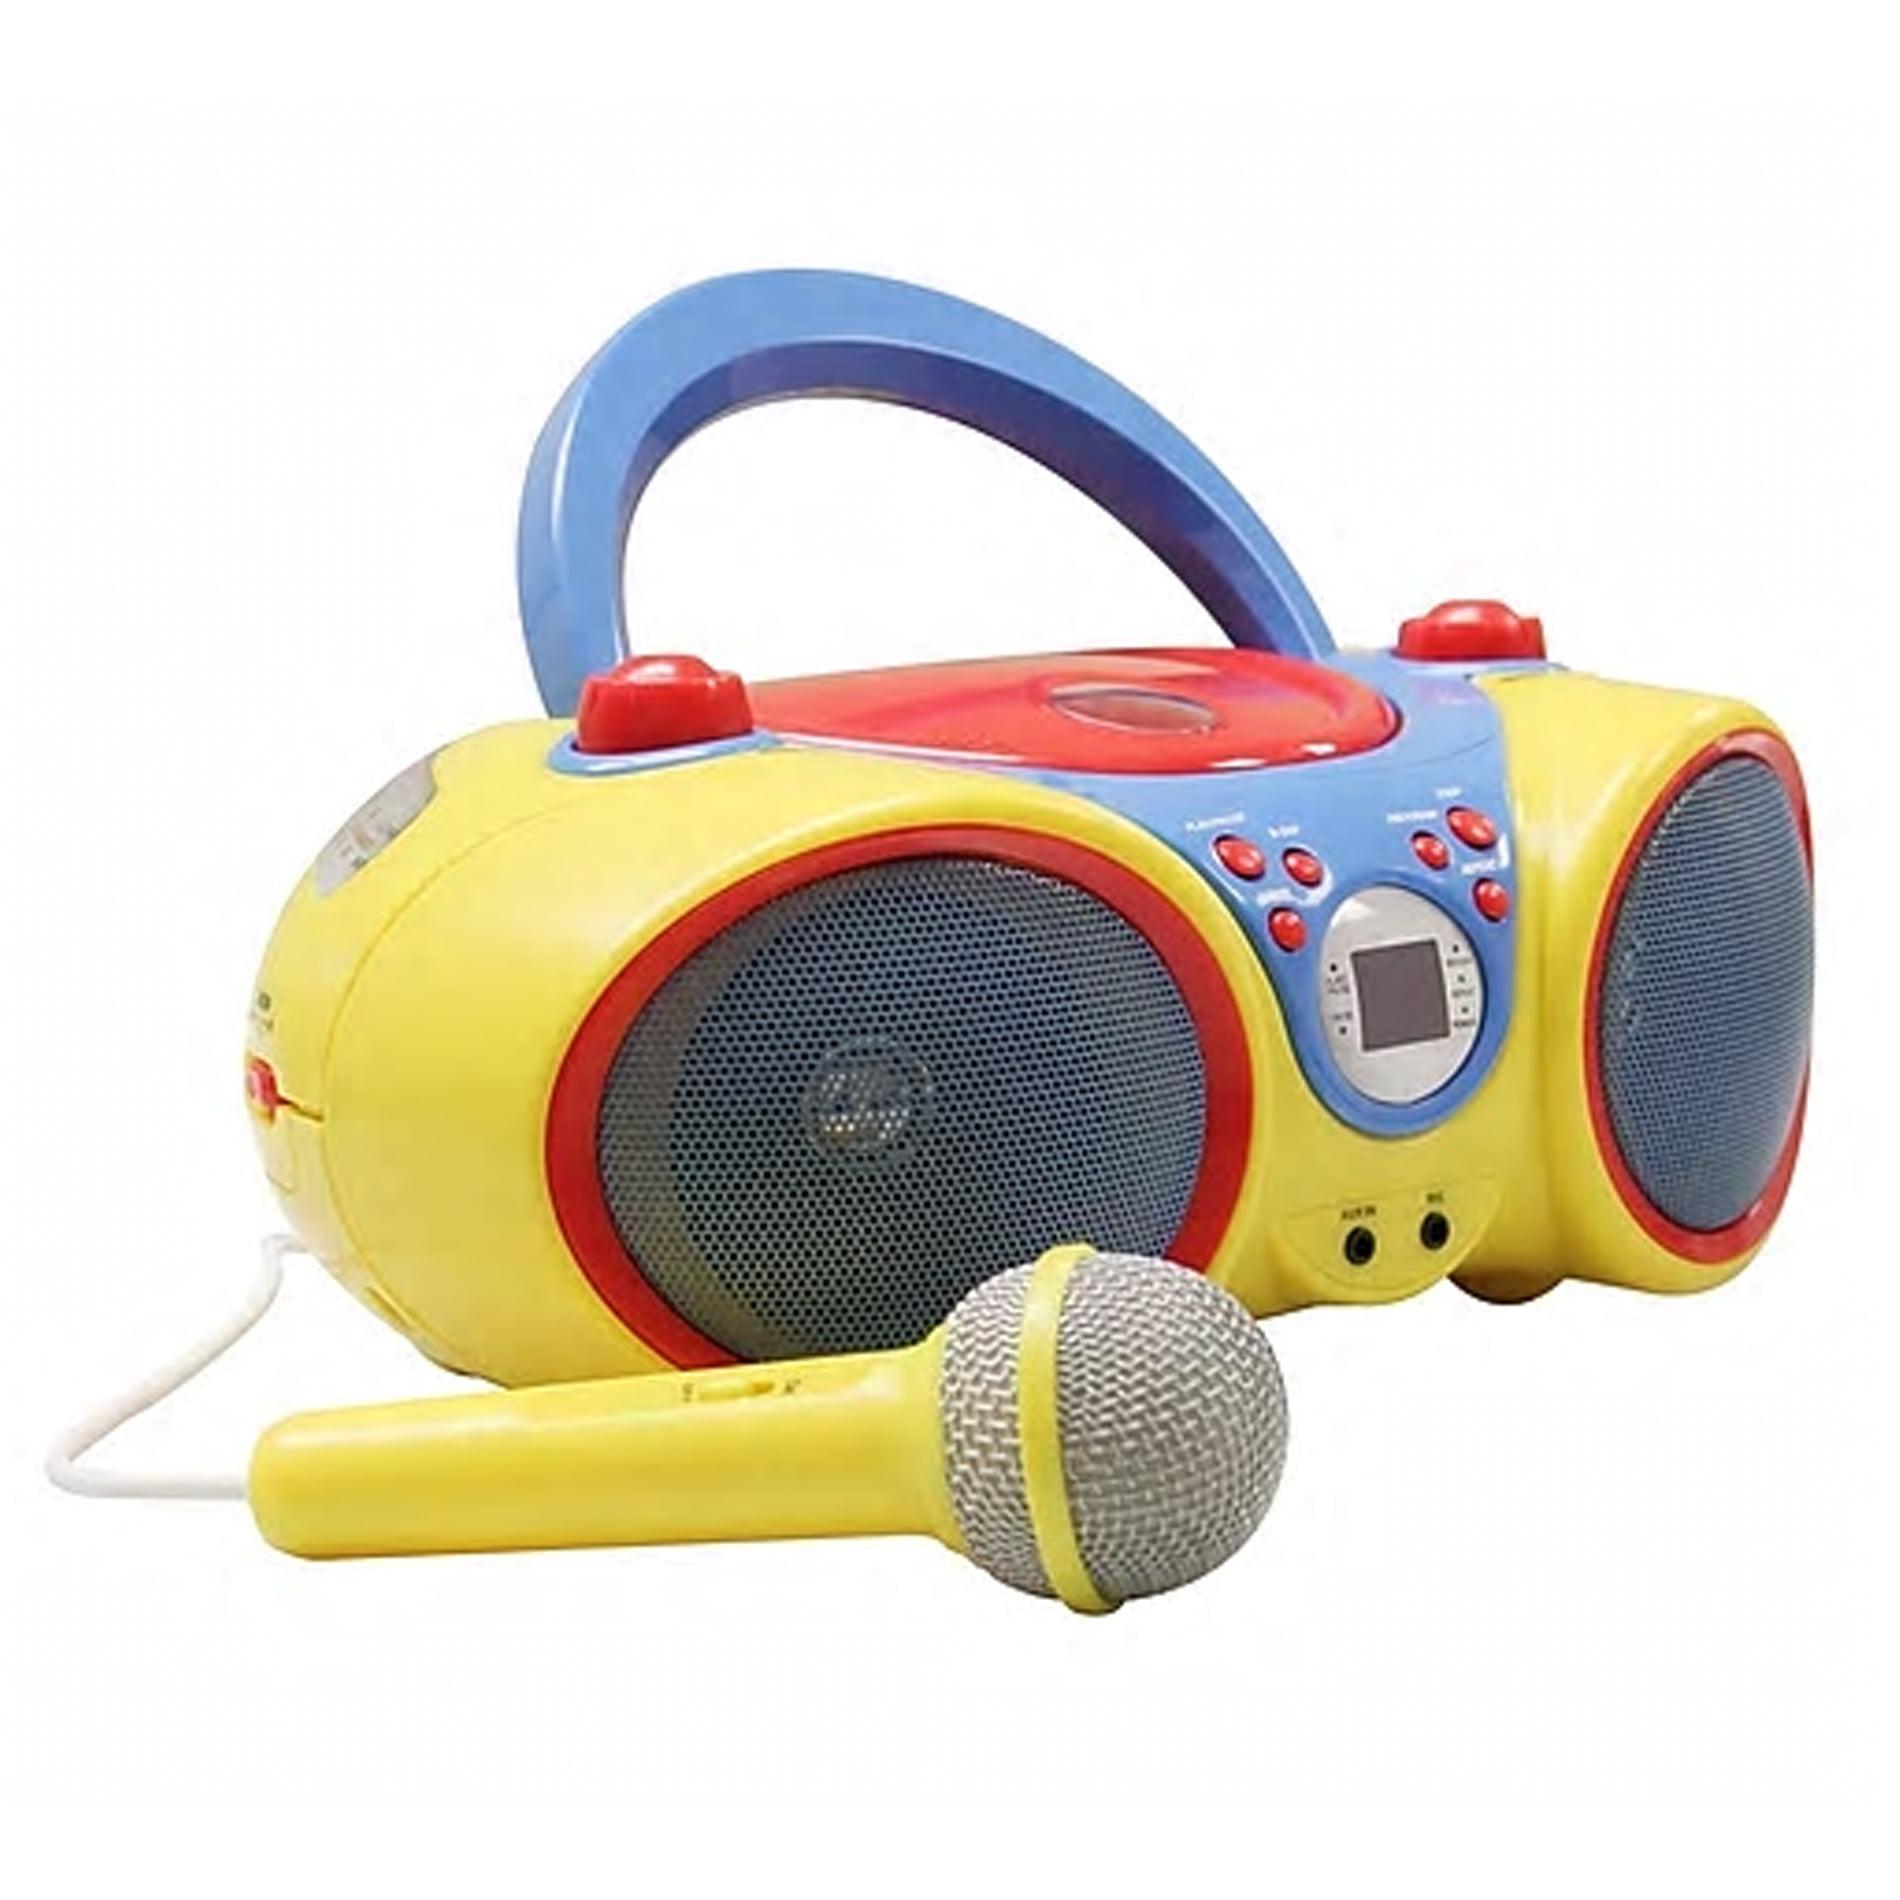 HamiltonBuhl Kids Audio CD Player Karaoke Machine with Microphone by Hamilton Buhl